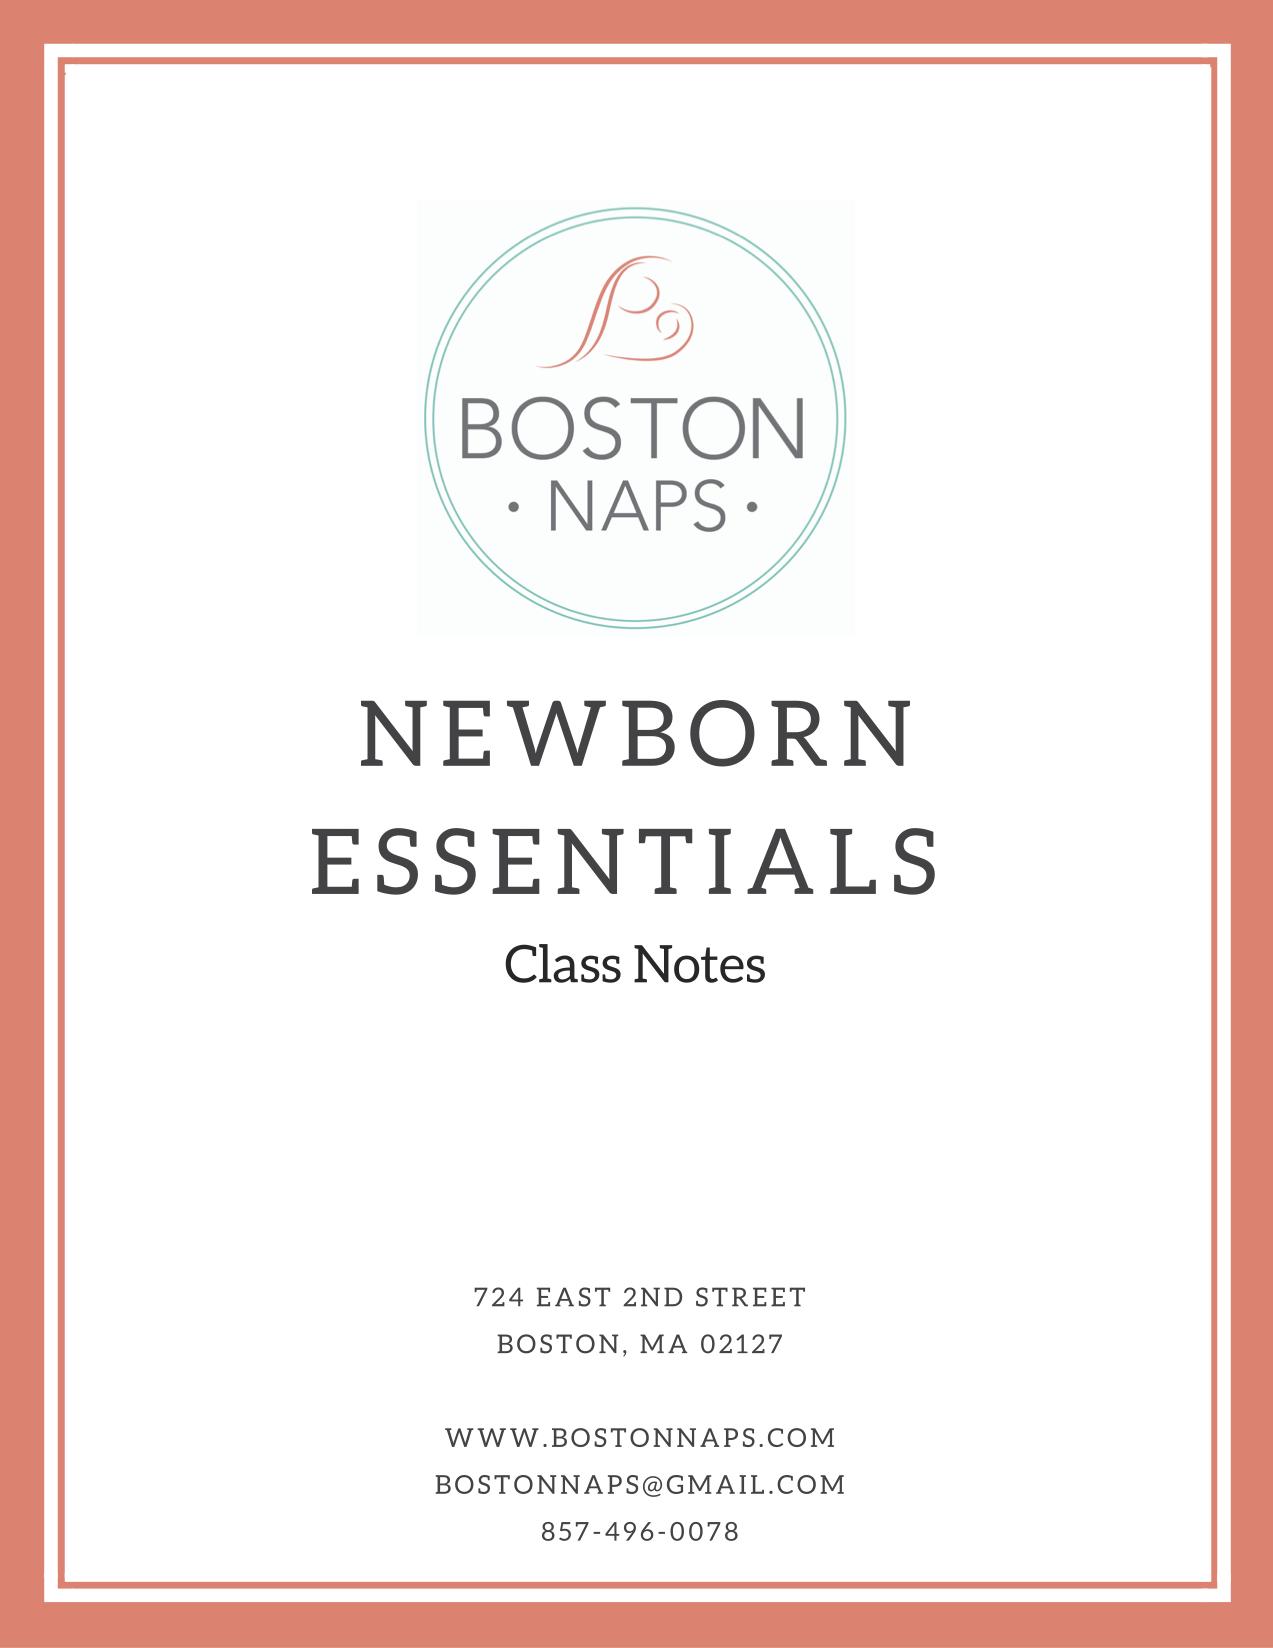 Newborn Essentials Class Notes.jpg